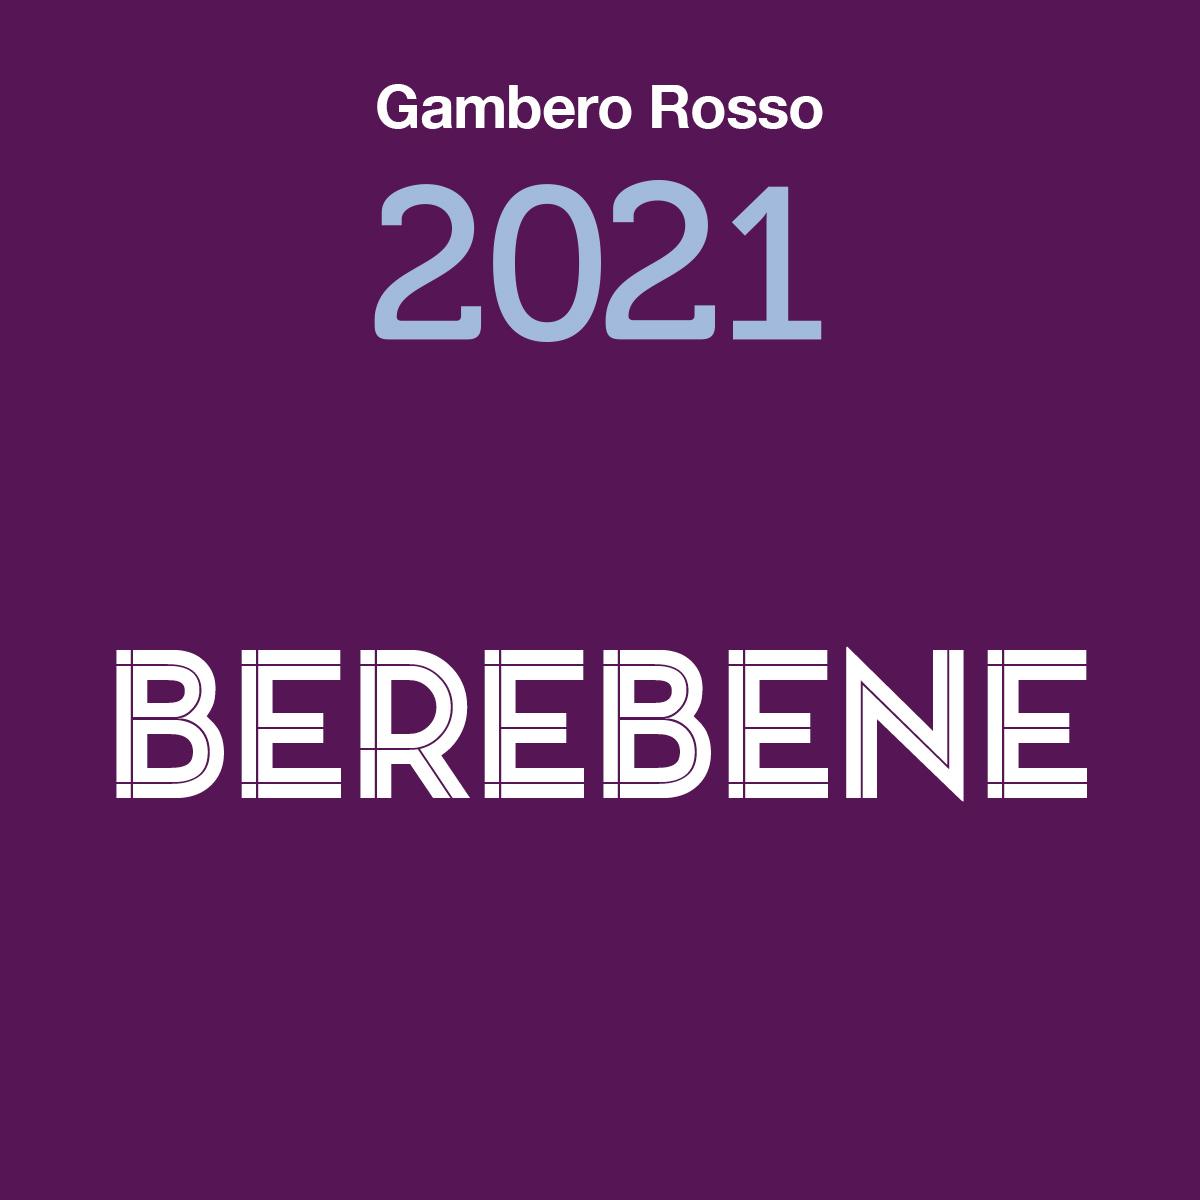 Aglianico 2017 receives the BereBene 2021 Award